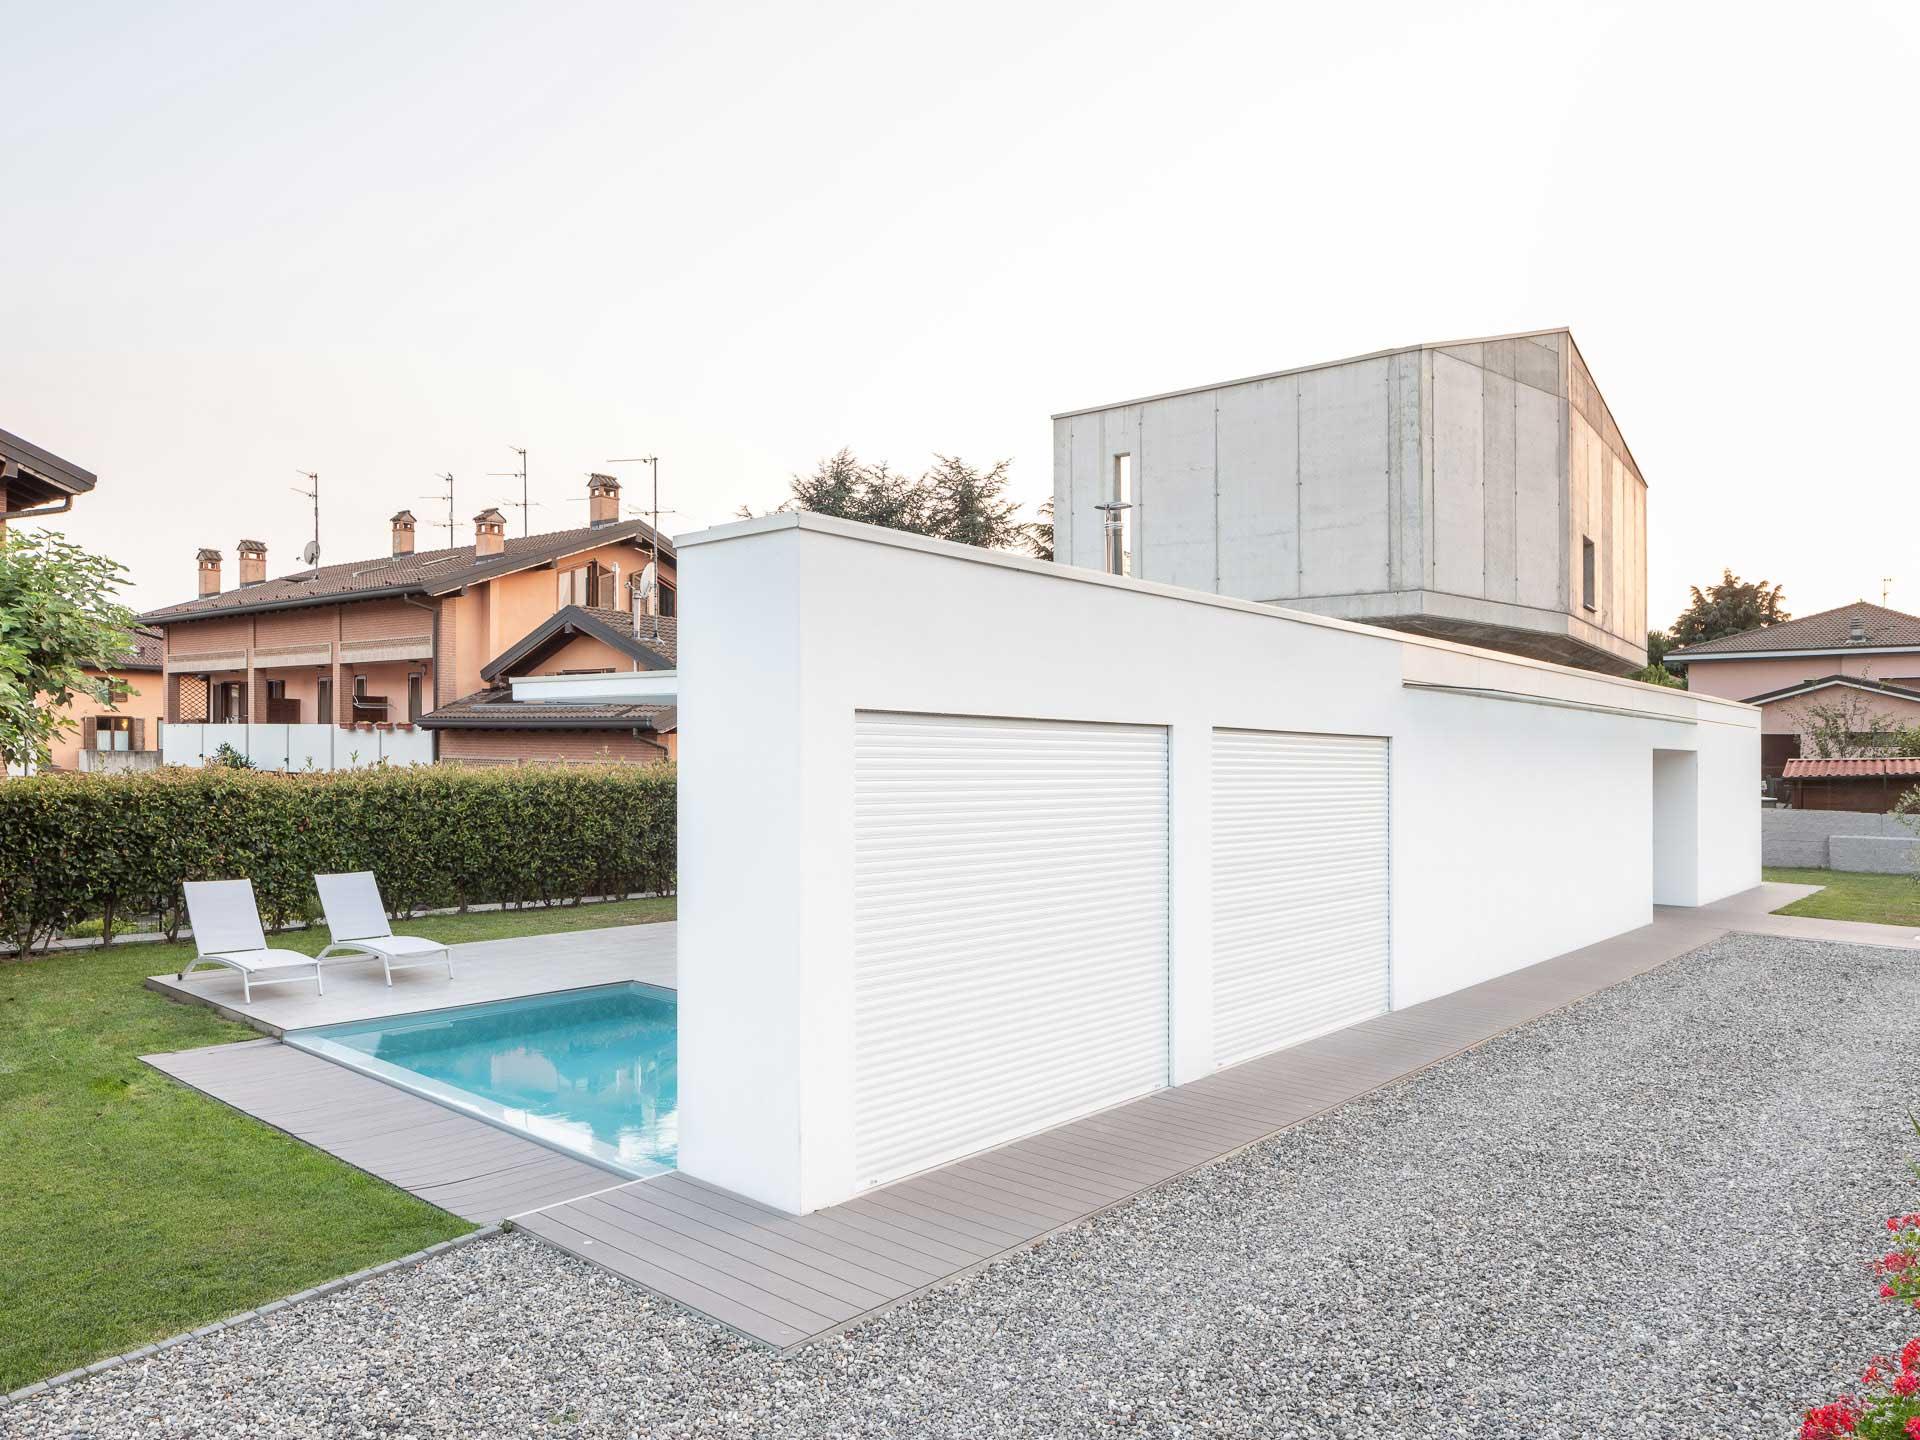 Casa unifamiliare a Casnate con Bernate (CO).